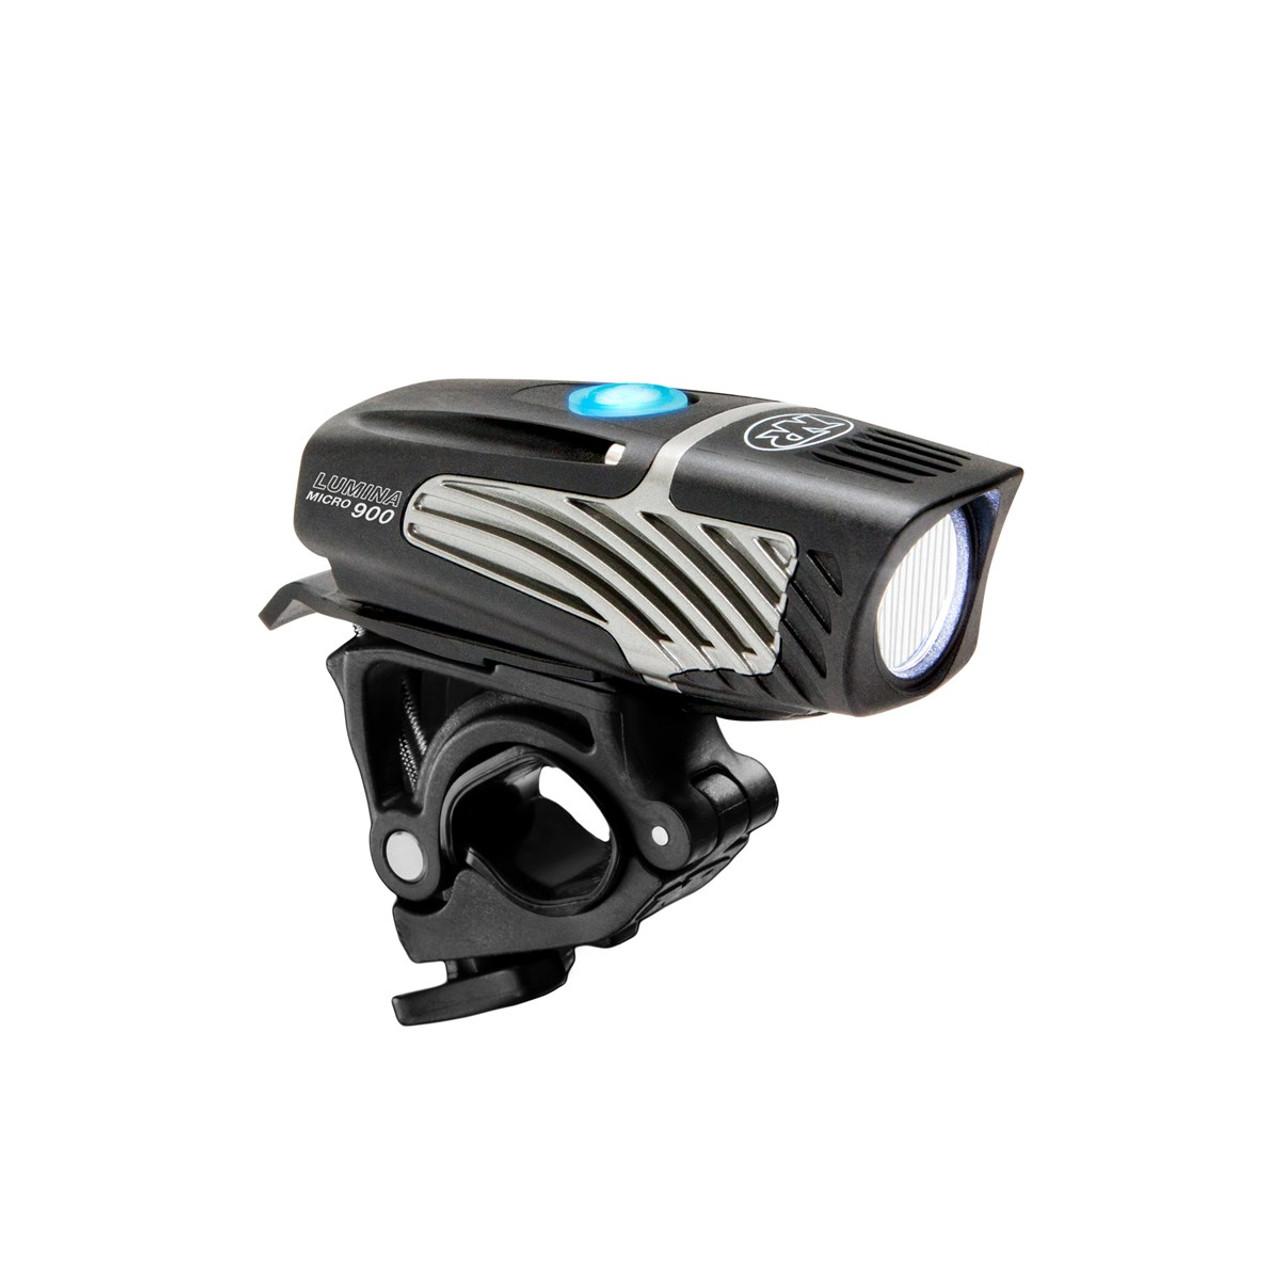 Niterider Lumina Micro 900 LED Front Light In Black